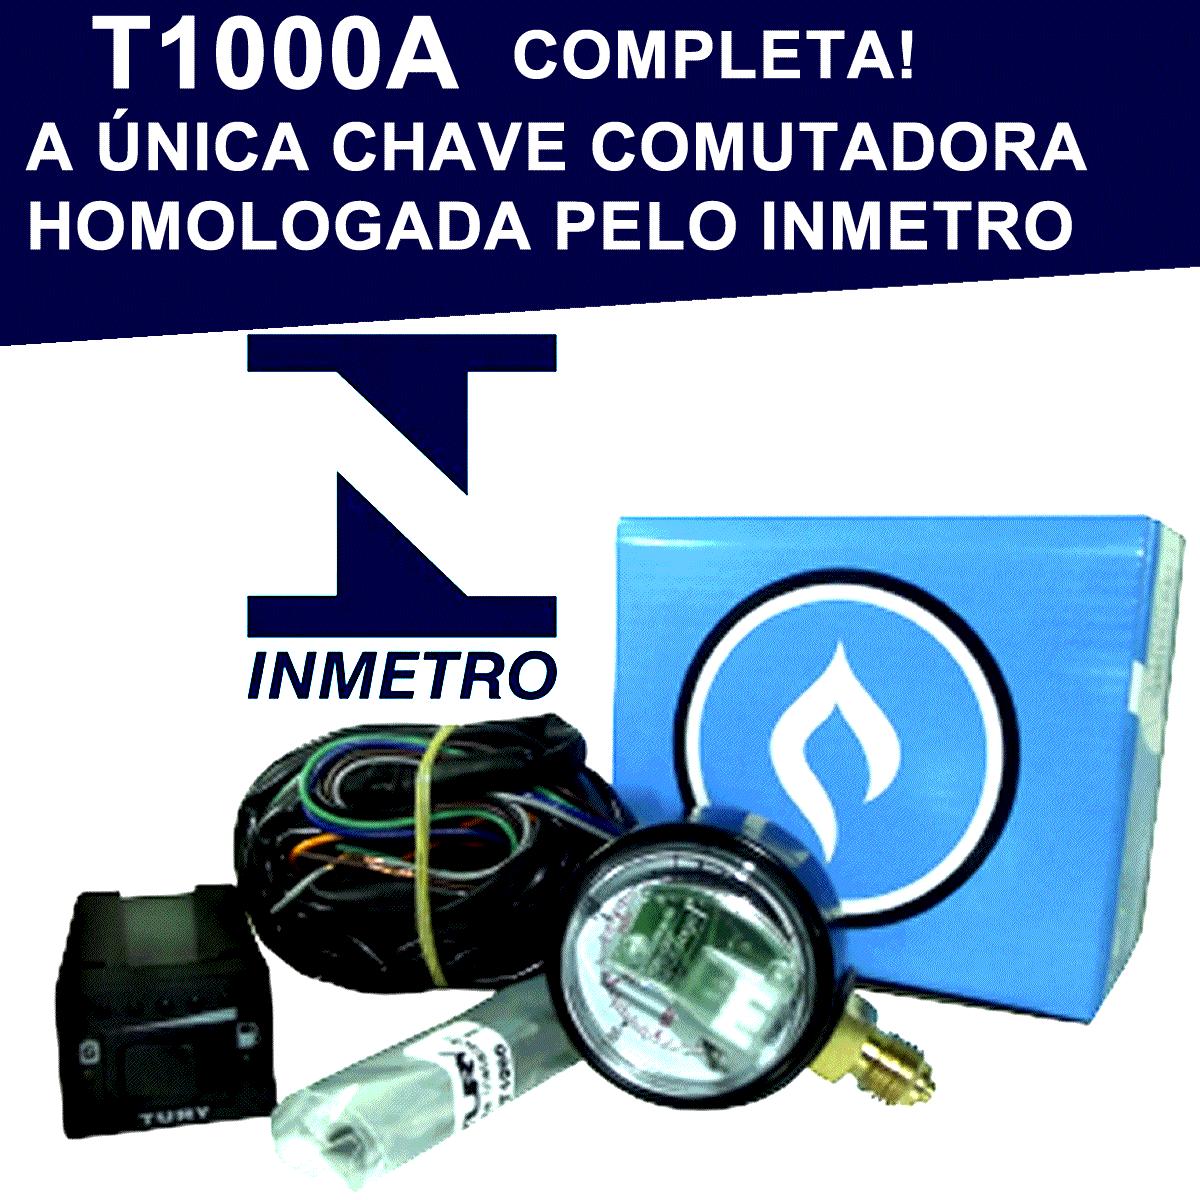 Chave Comutadora T1000A e Emulador T54A TURY GAS